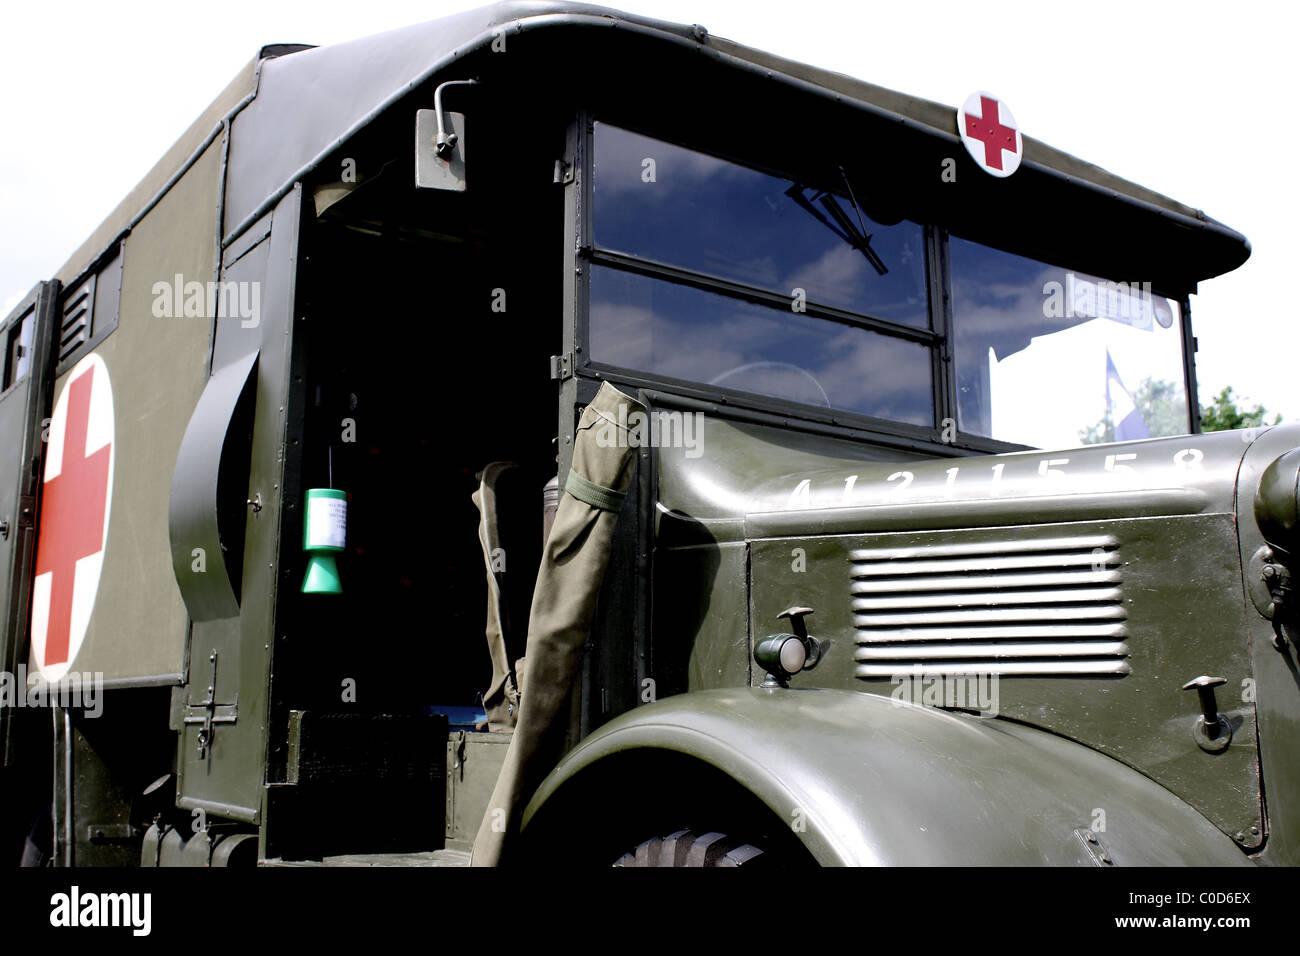 Awm camiones renault AE wkhz rdc cruz roja